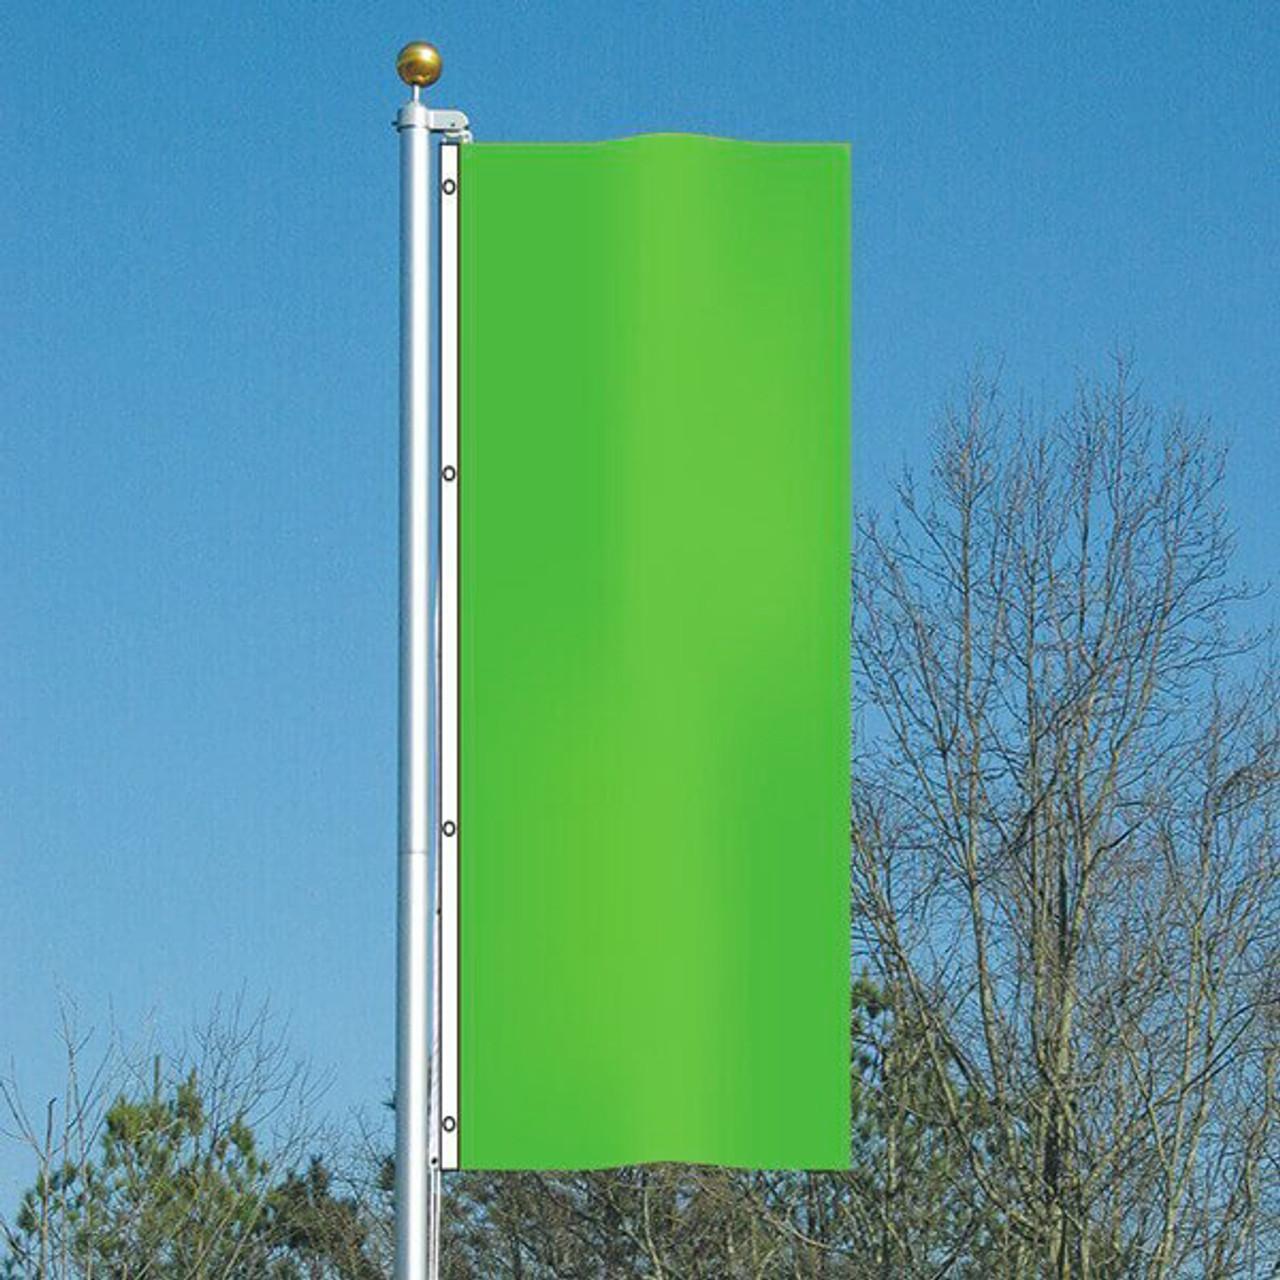 3' x 8' Vivacity Vertical Flag - Be Seen Green